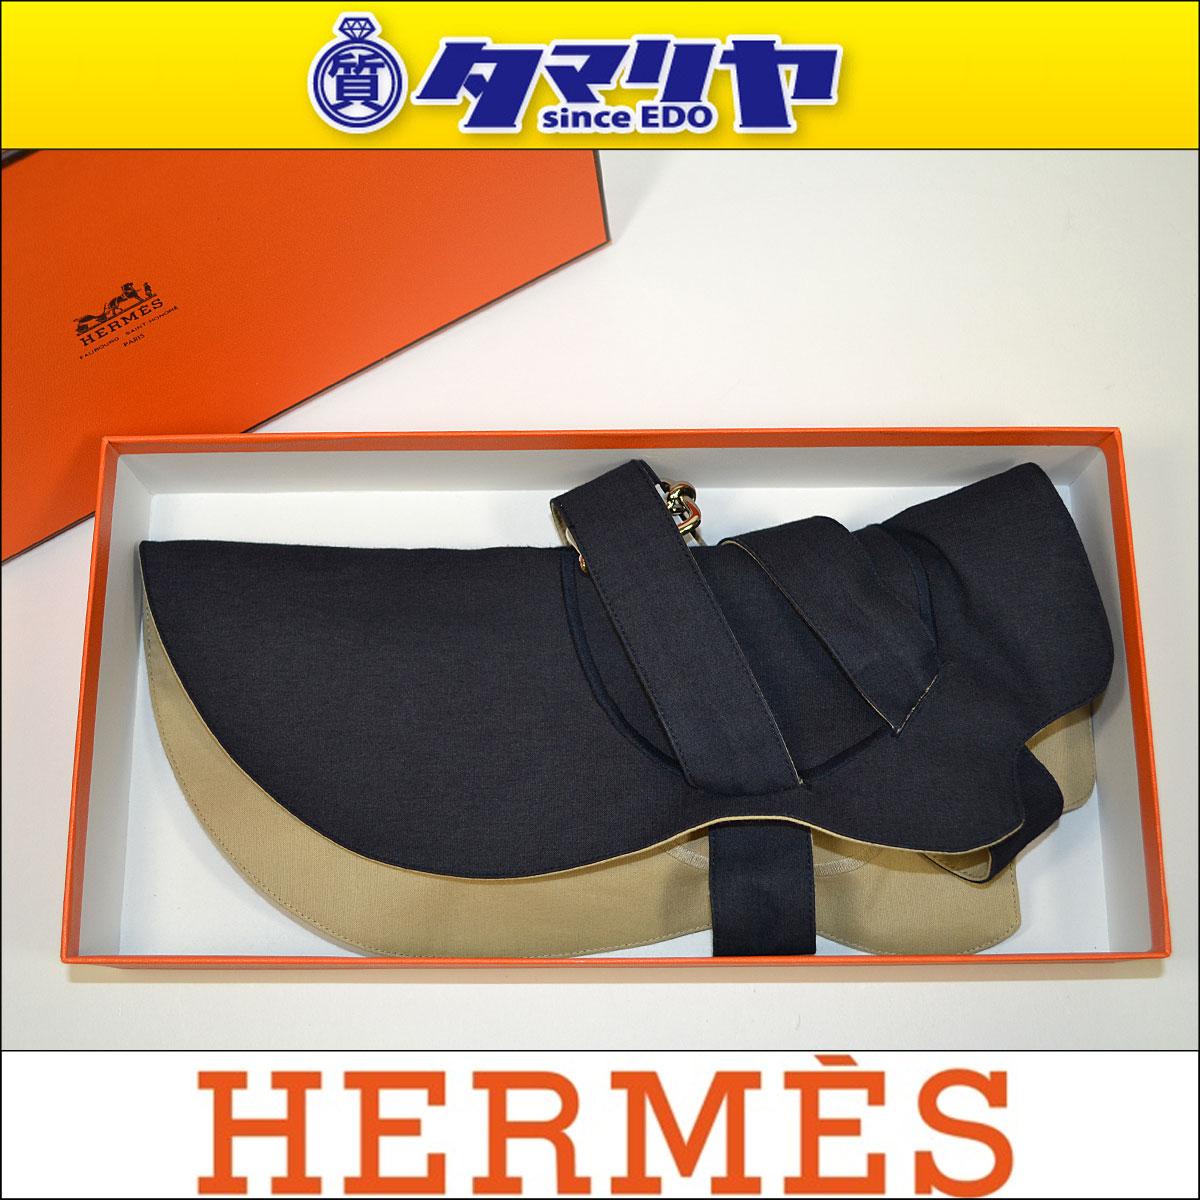 Hermes エルメス ドッグウェア Sサイズ デニム【送料無料】【代引き手数料無料】犬用の服 小型犬用【中古】30450603